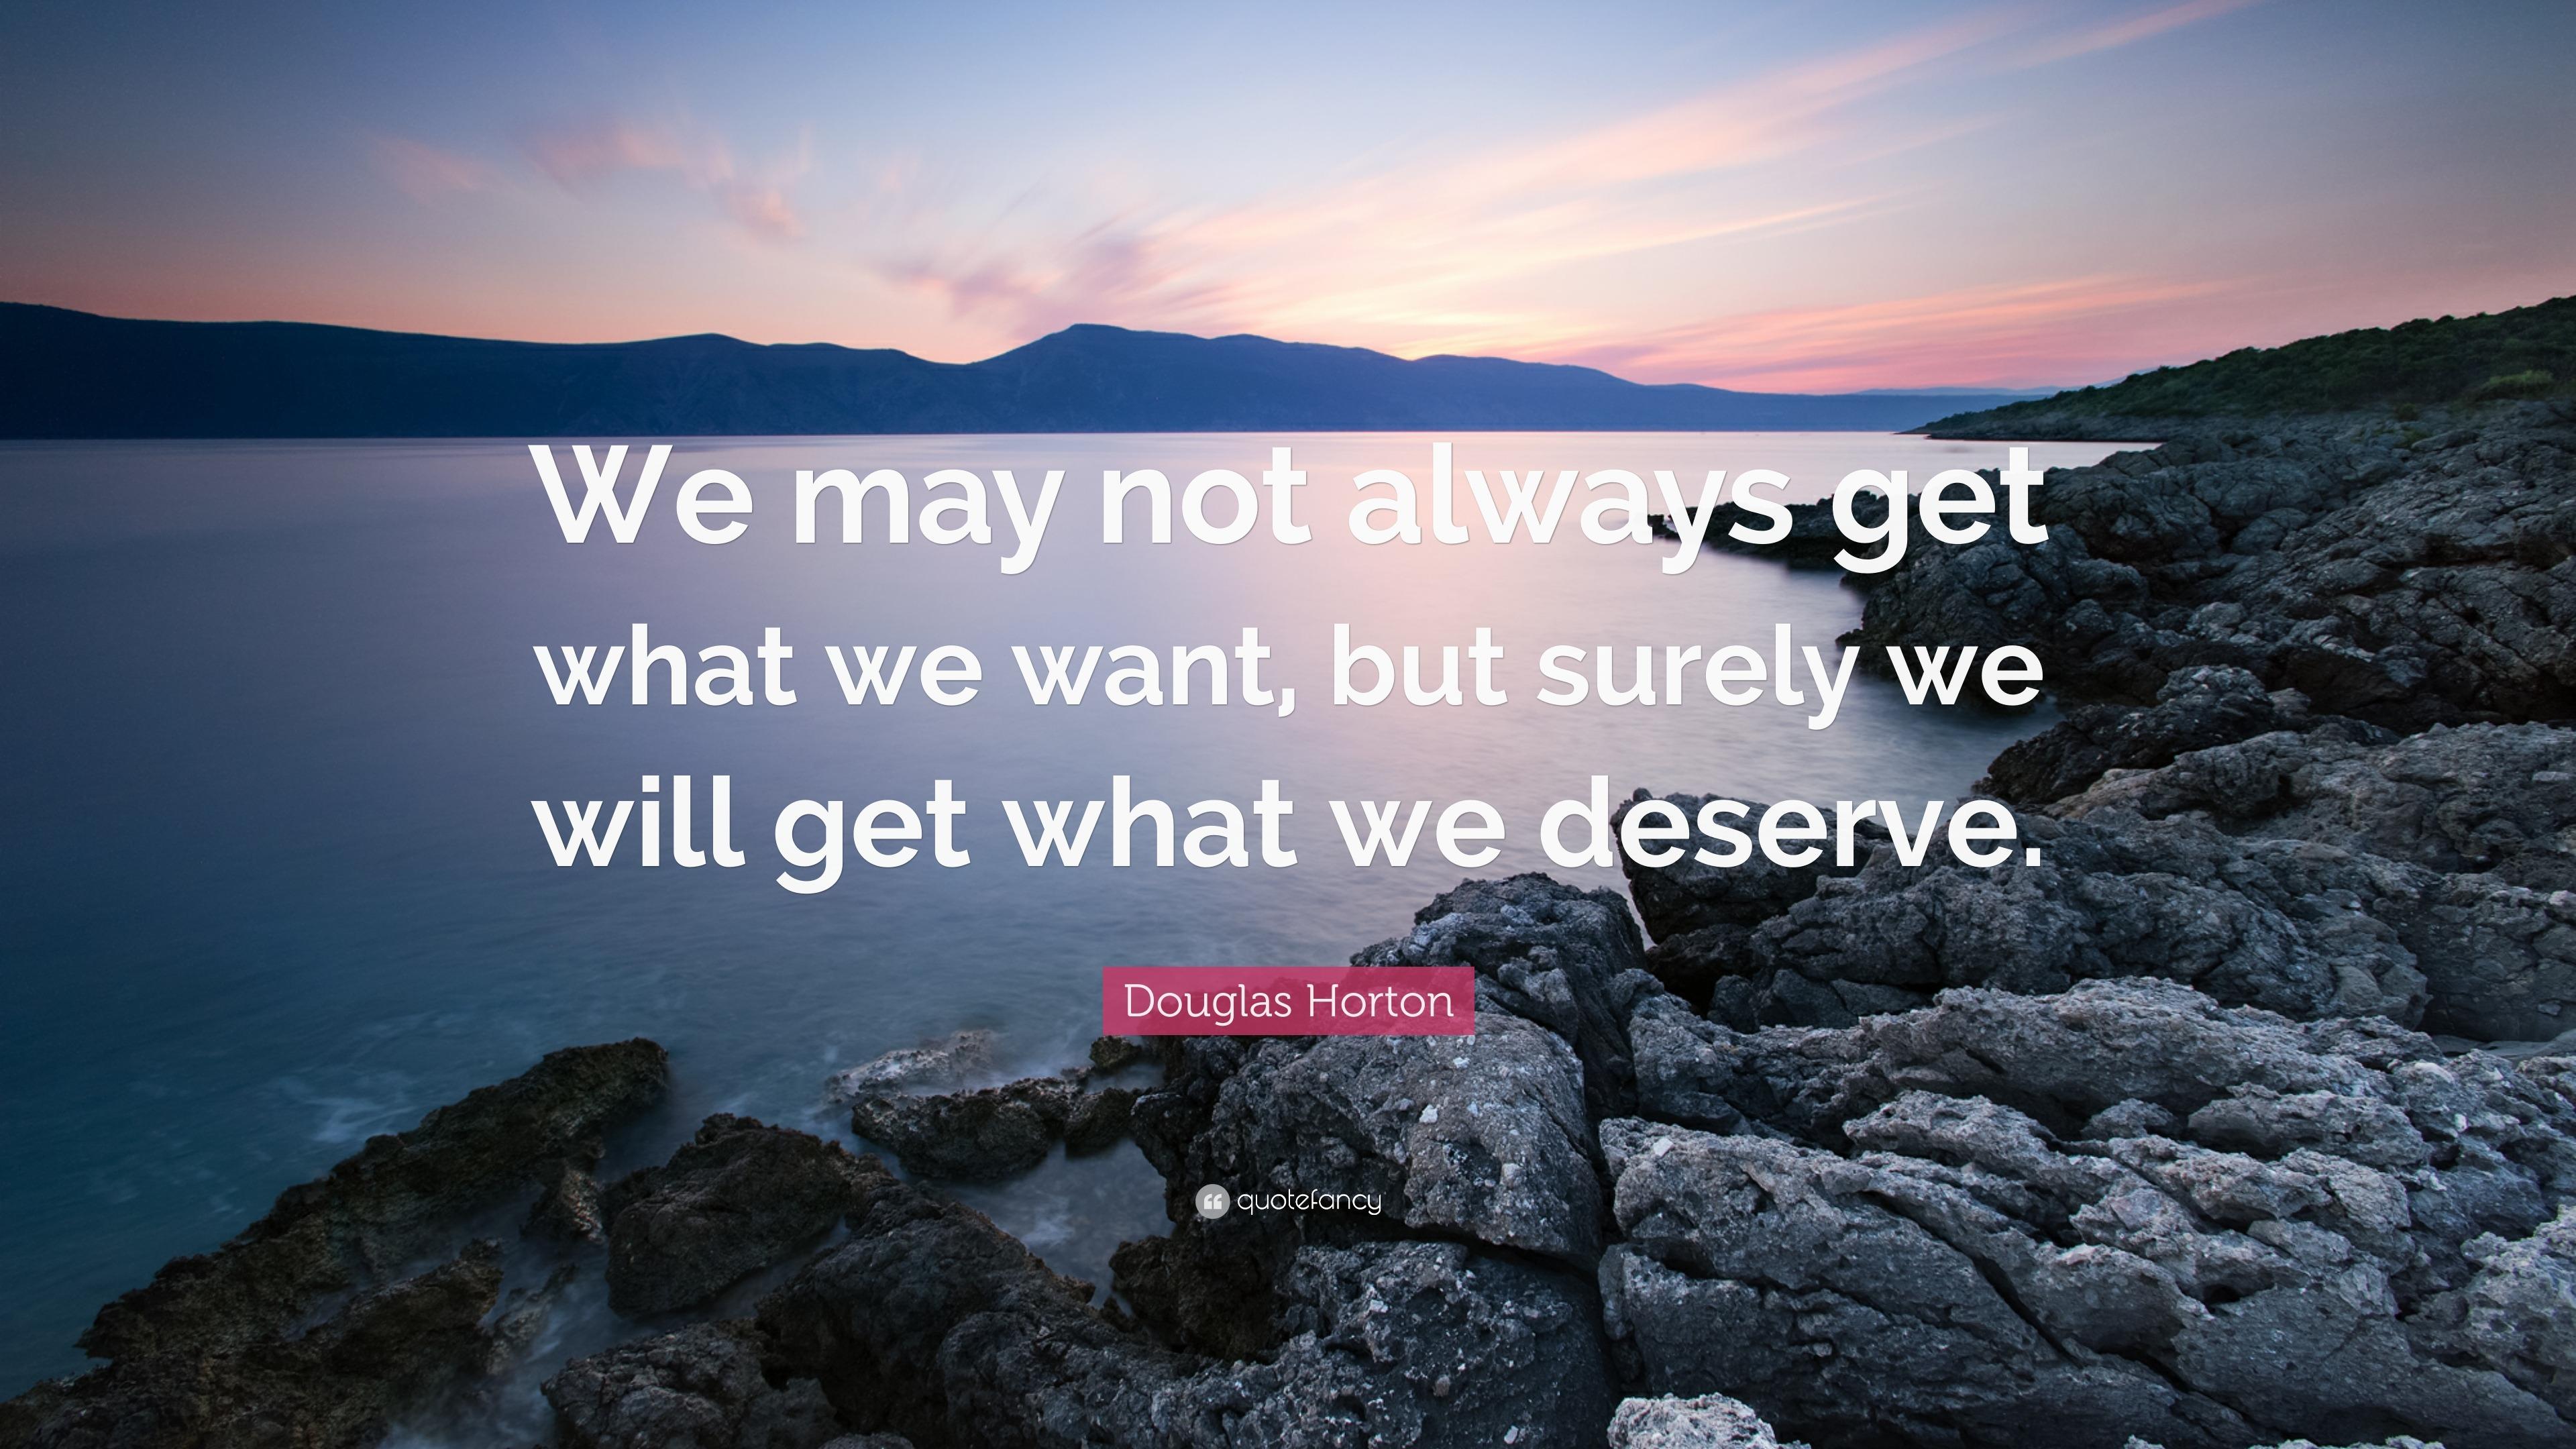 we get what we deserve